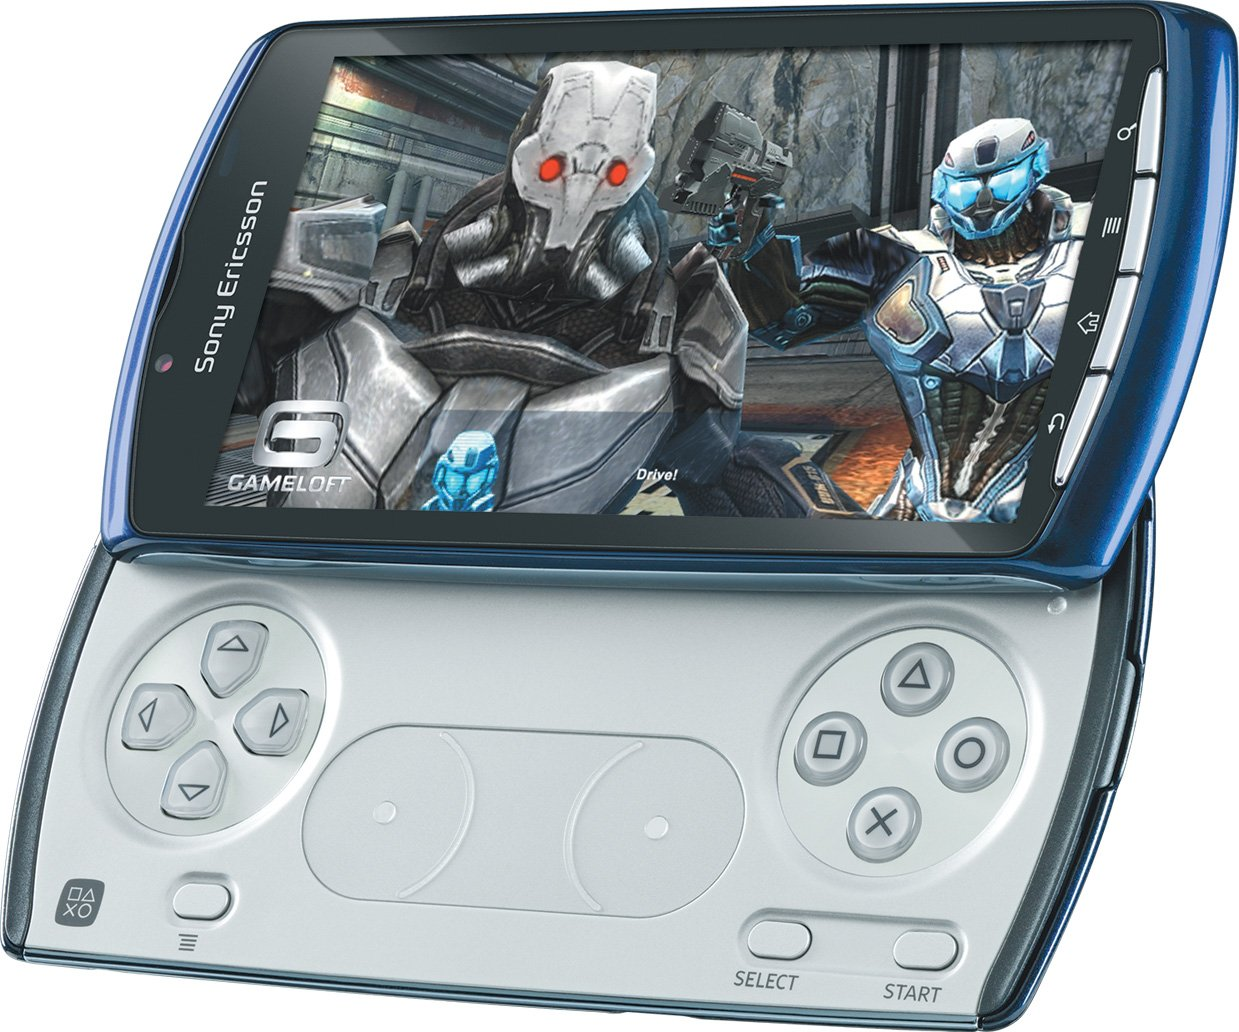 Amazon.com: Sony Ericsson Xperia PLAY 4 G teléfono Android ...